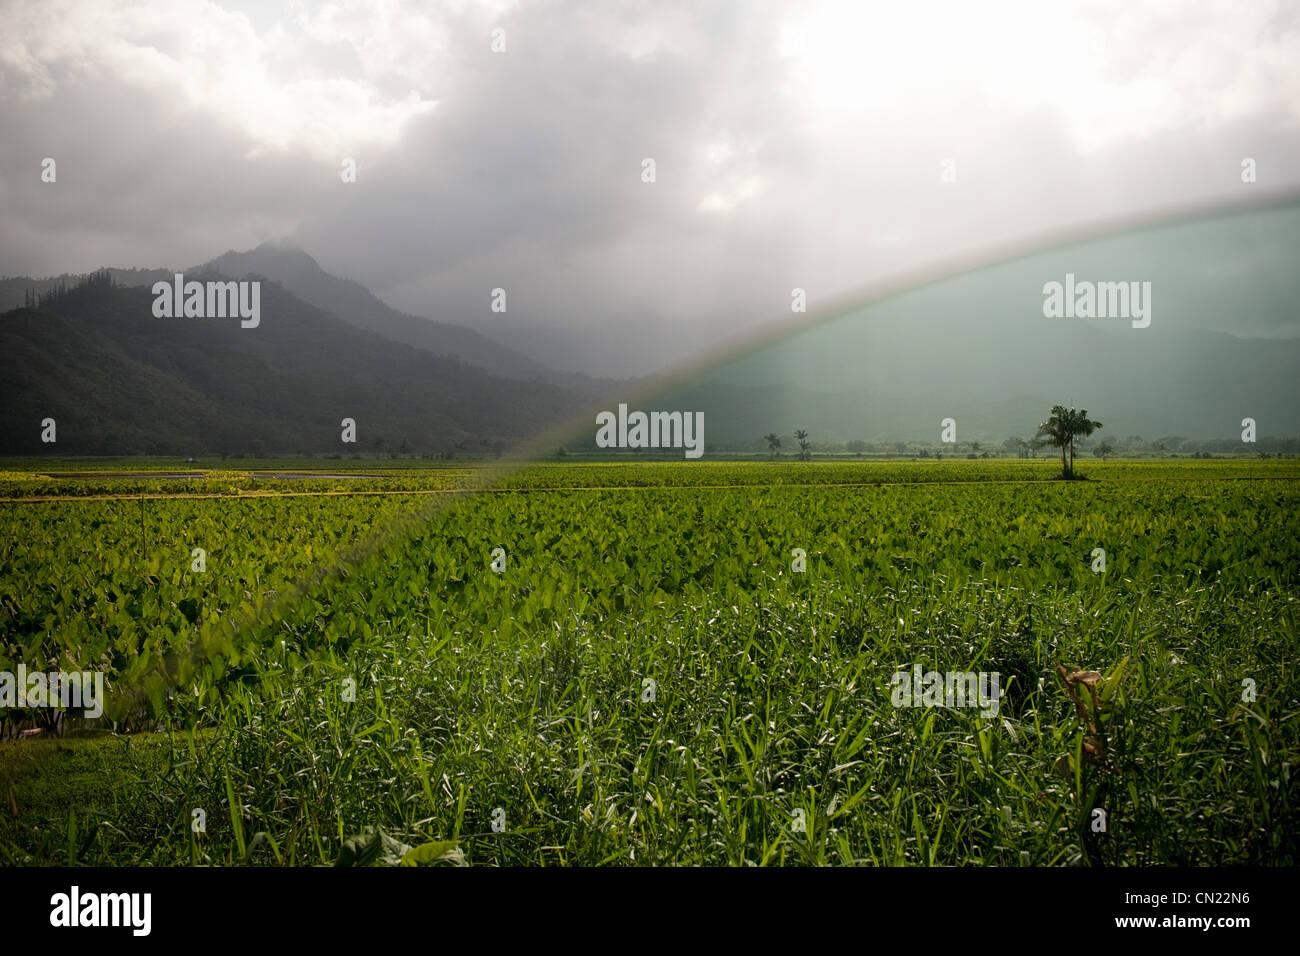 Hawaiian paisaje visto a través de la ventana de coche Imagen De Stock